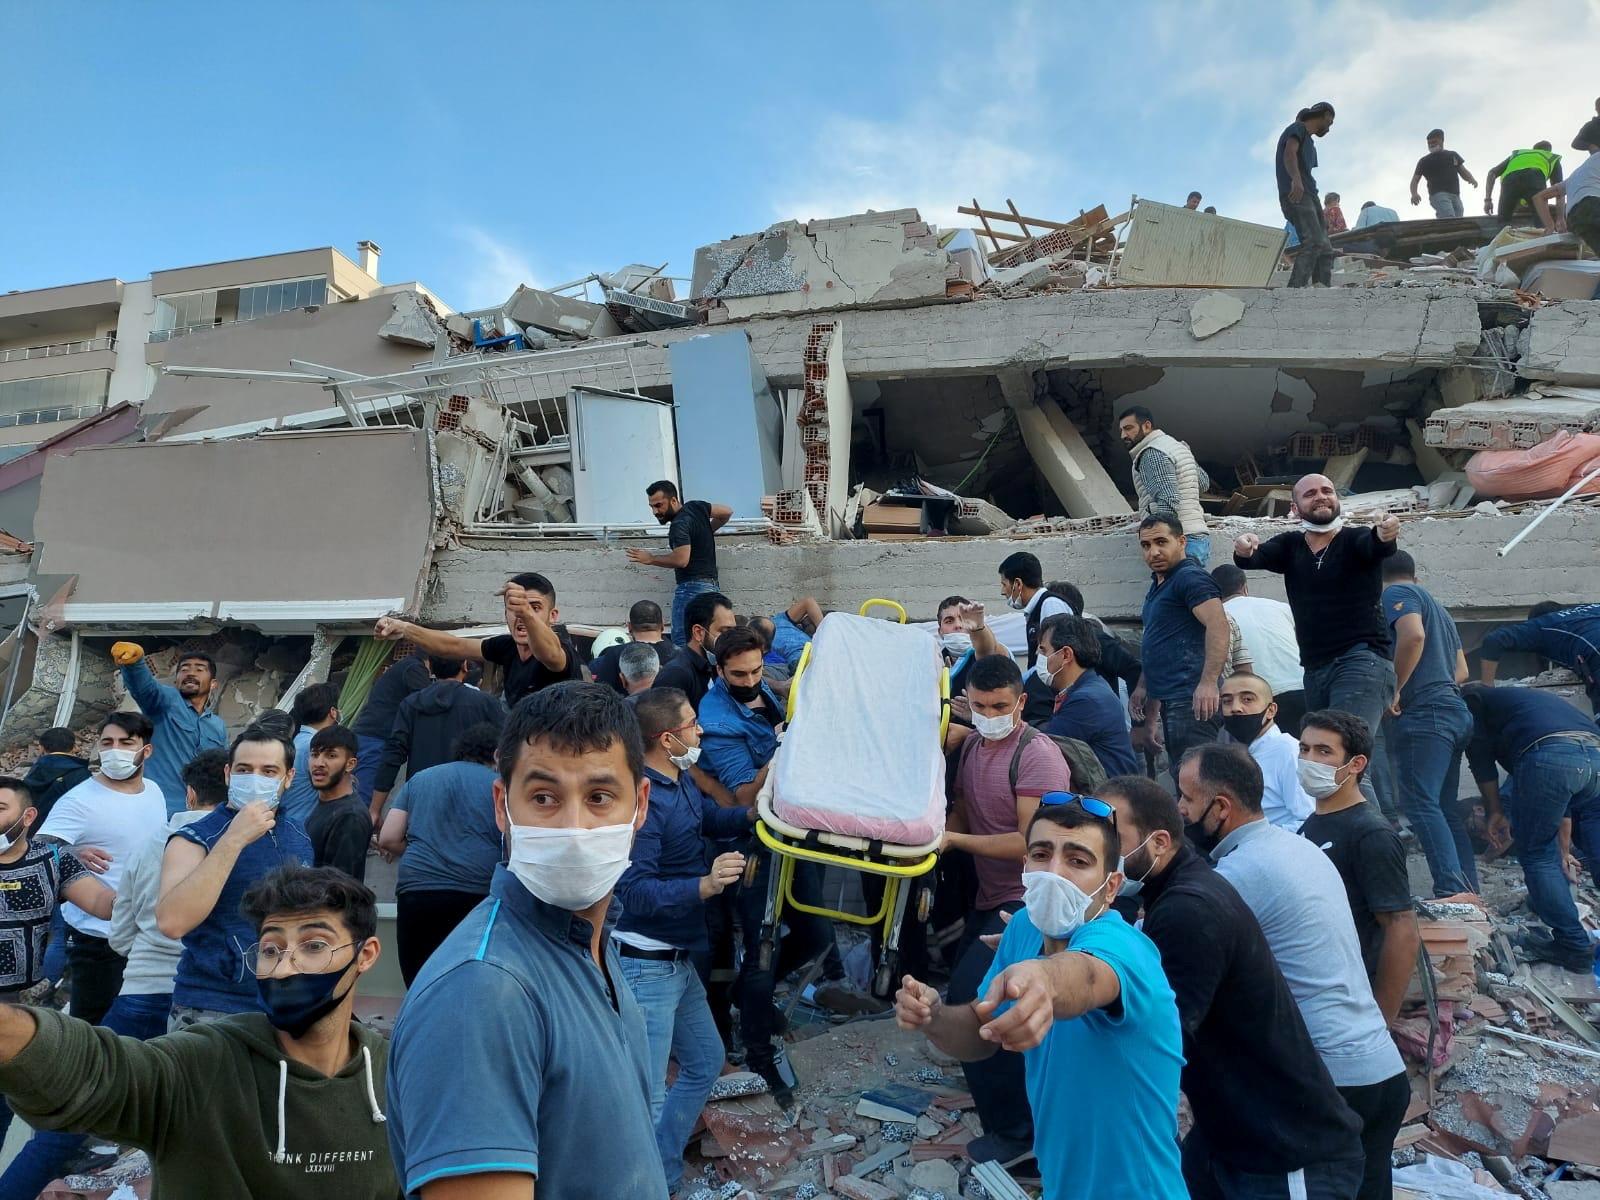 Количество жертв землетрясения в Турции достигло 58